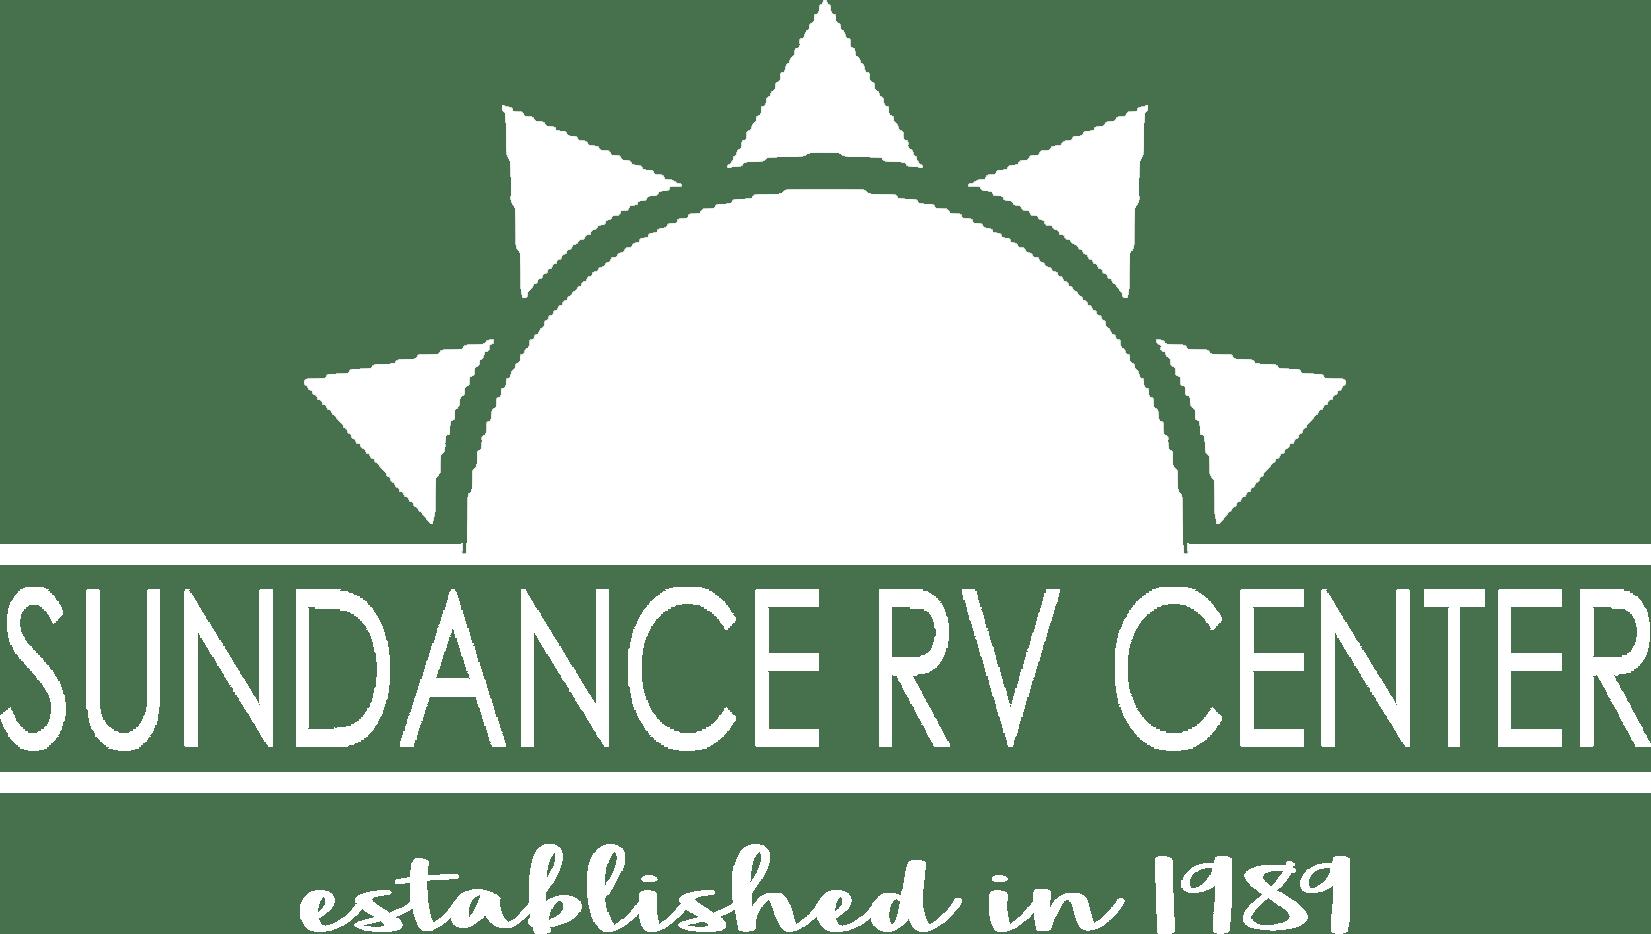 Sundance RV Center